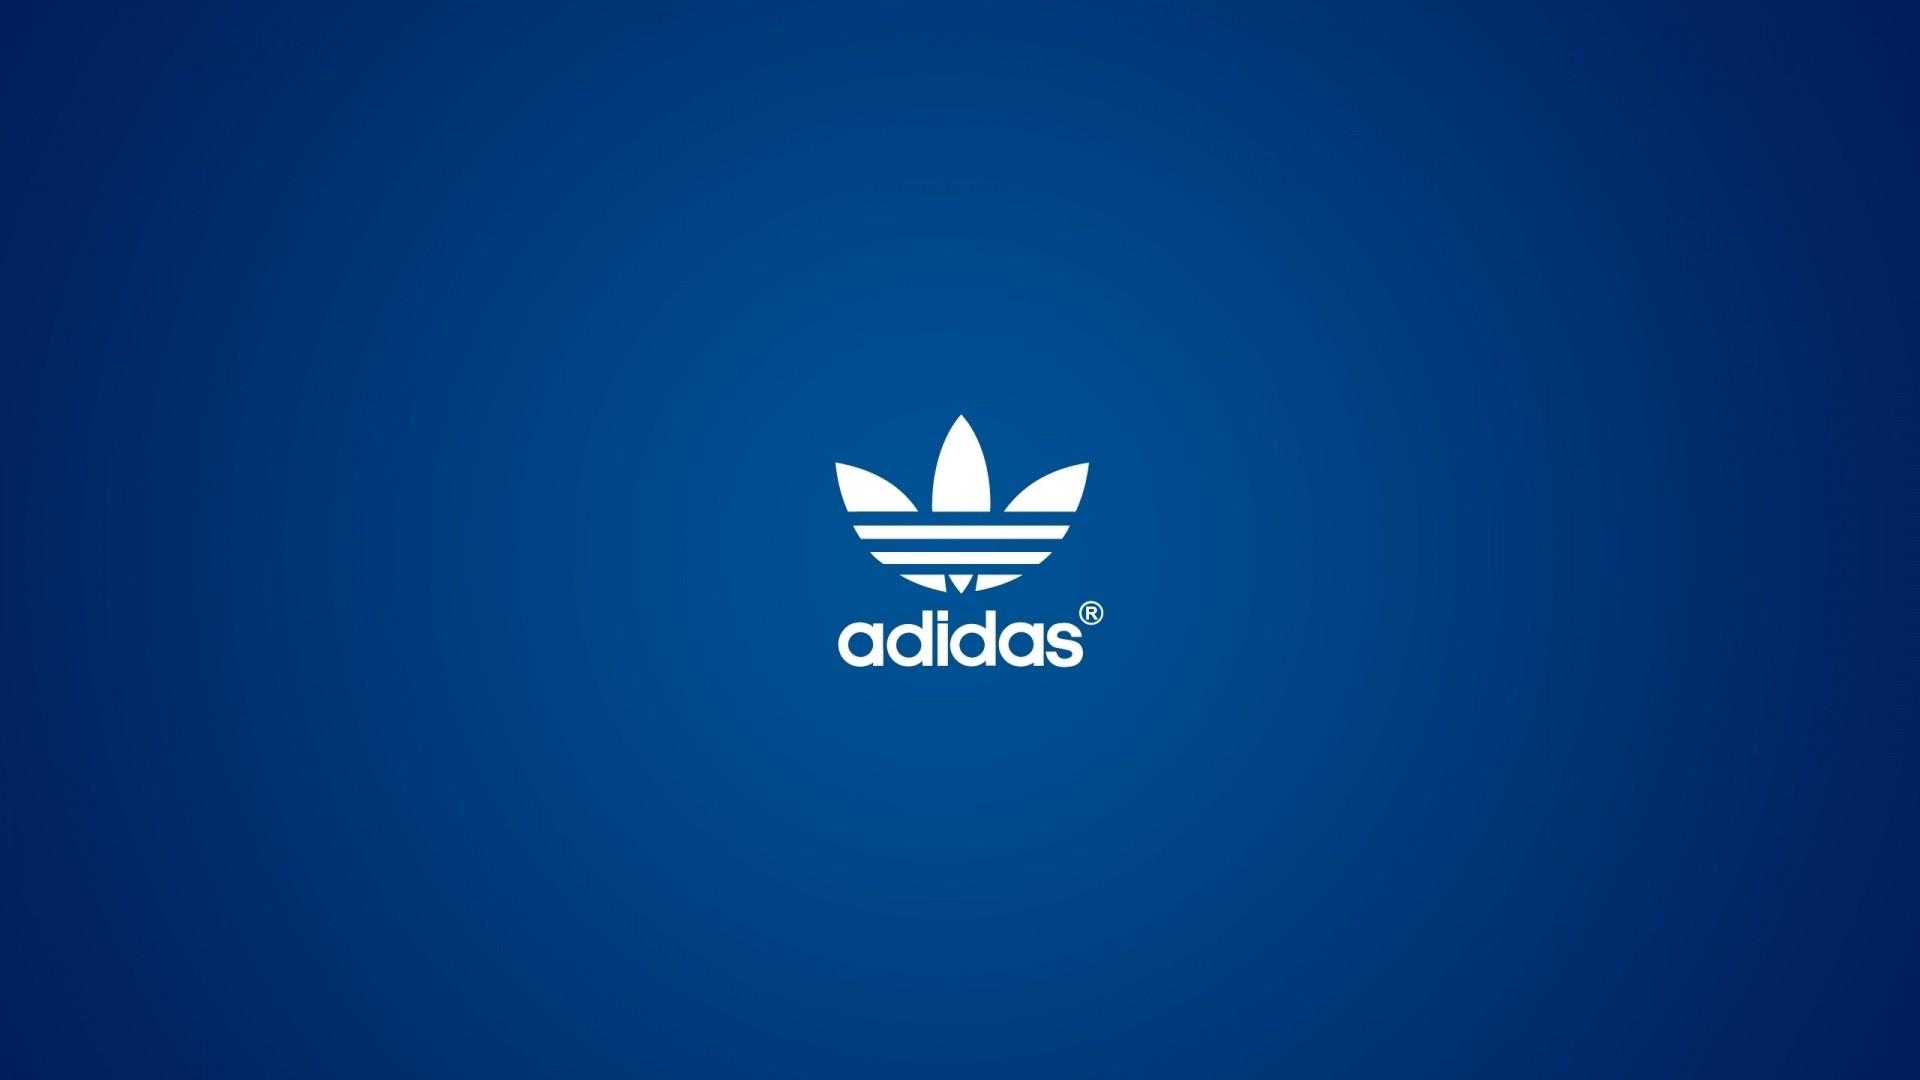 Adidas Blue Logo HD Wallpaper 1080p